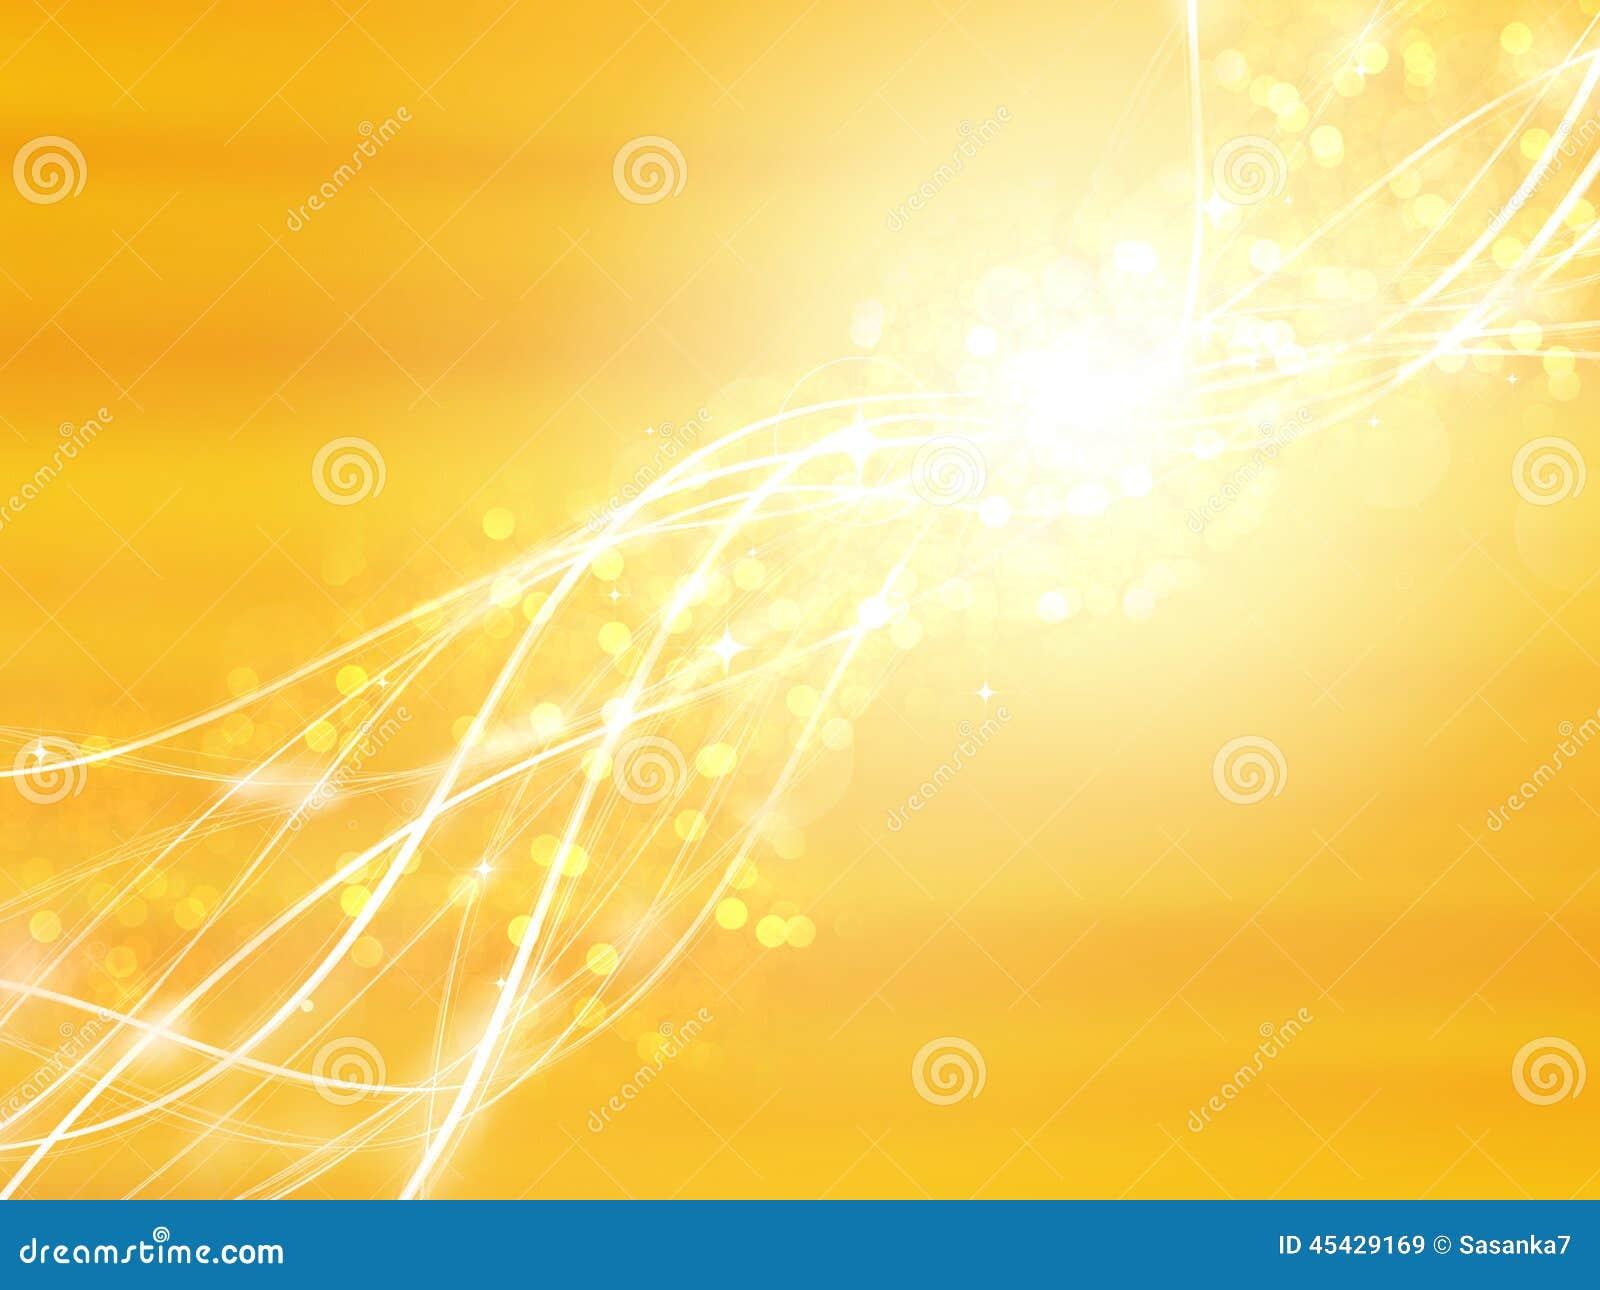 yellow sparkling background stock illustration image